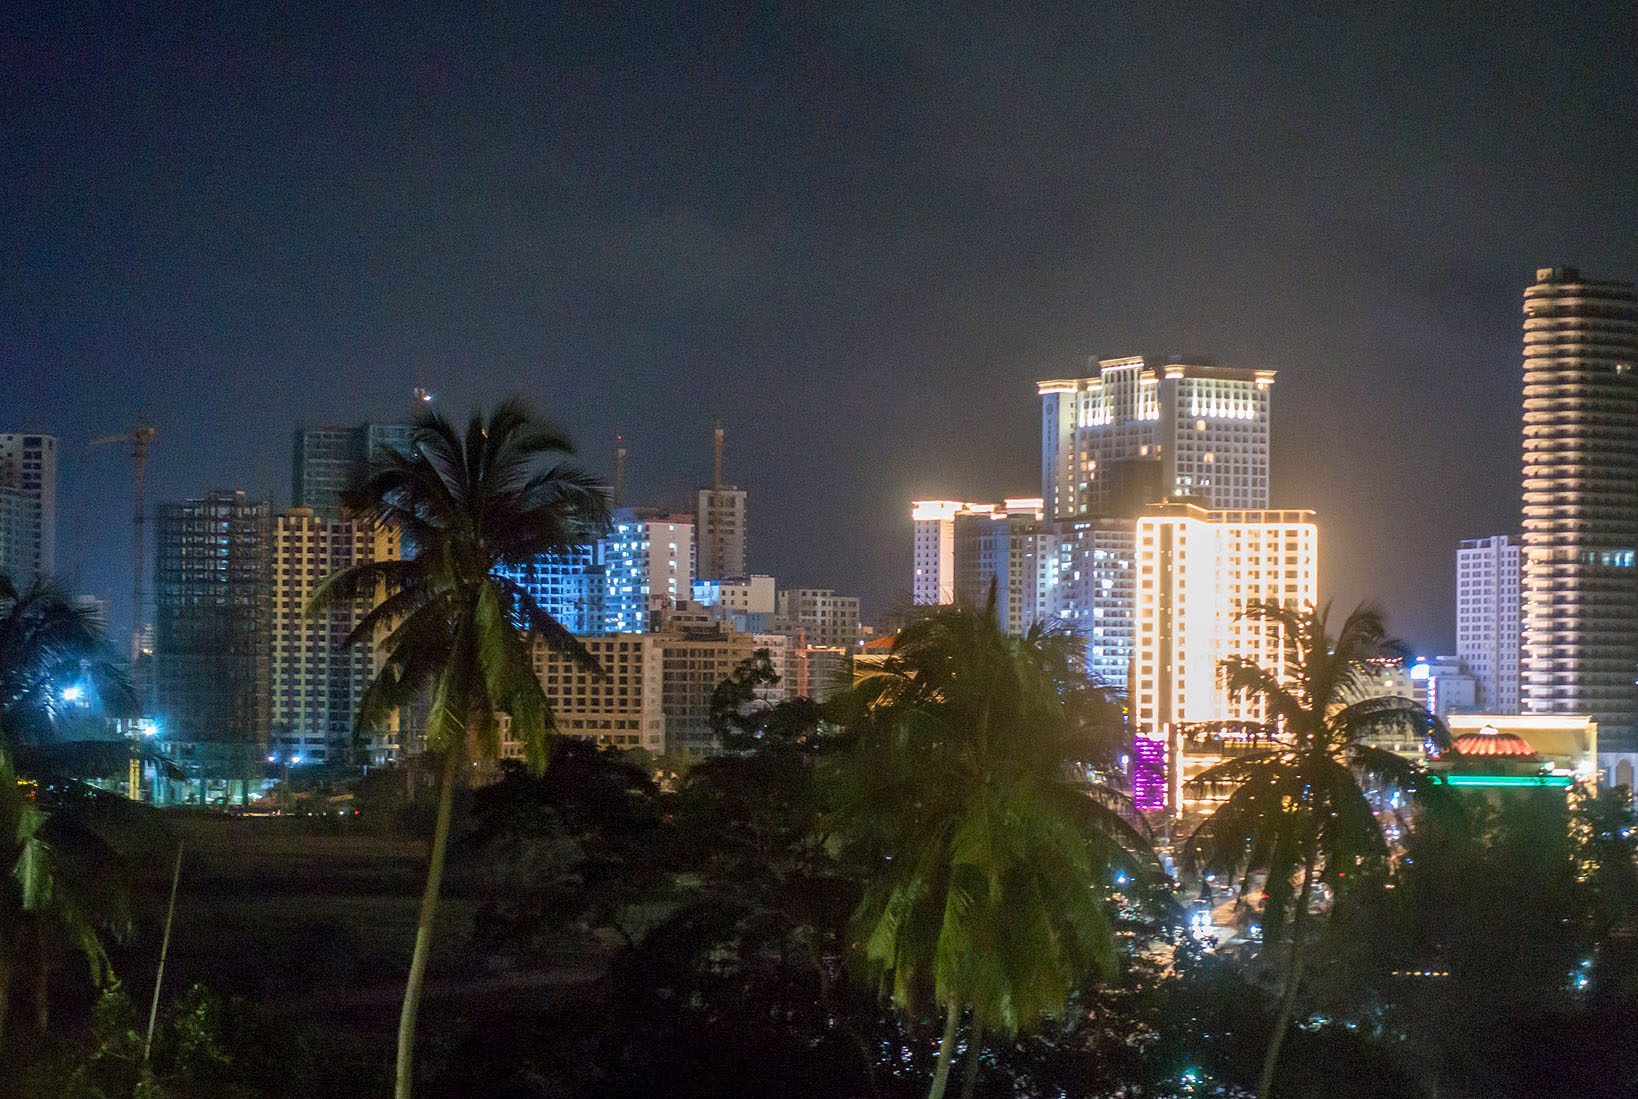 Sihanoukville August 2020 3 by Mike Gebremedhin.jpg